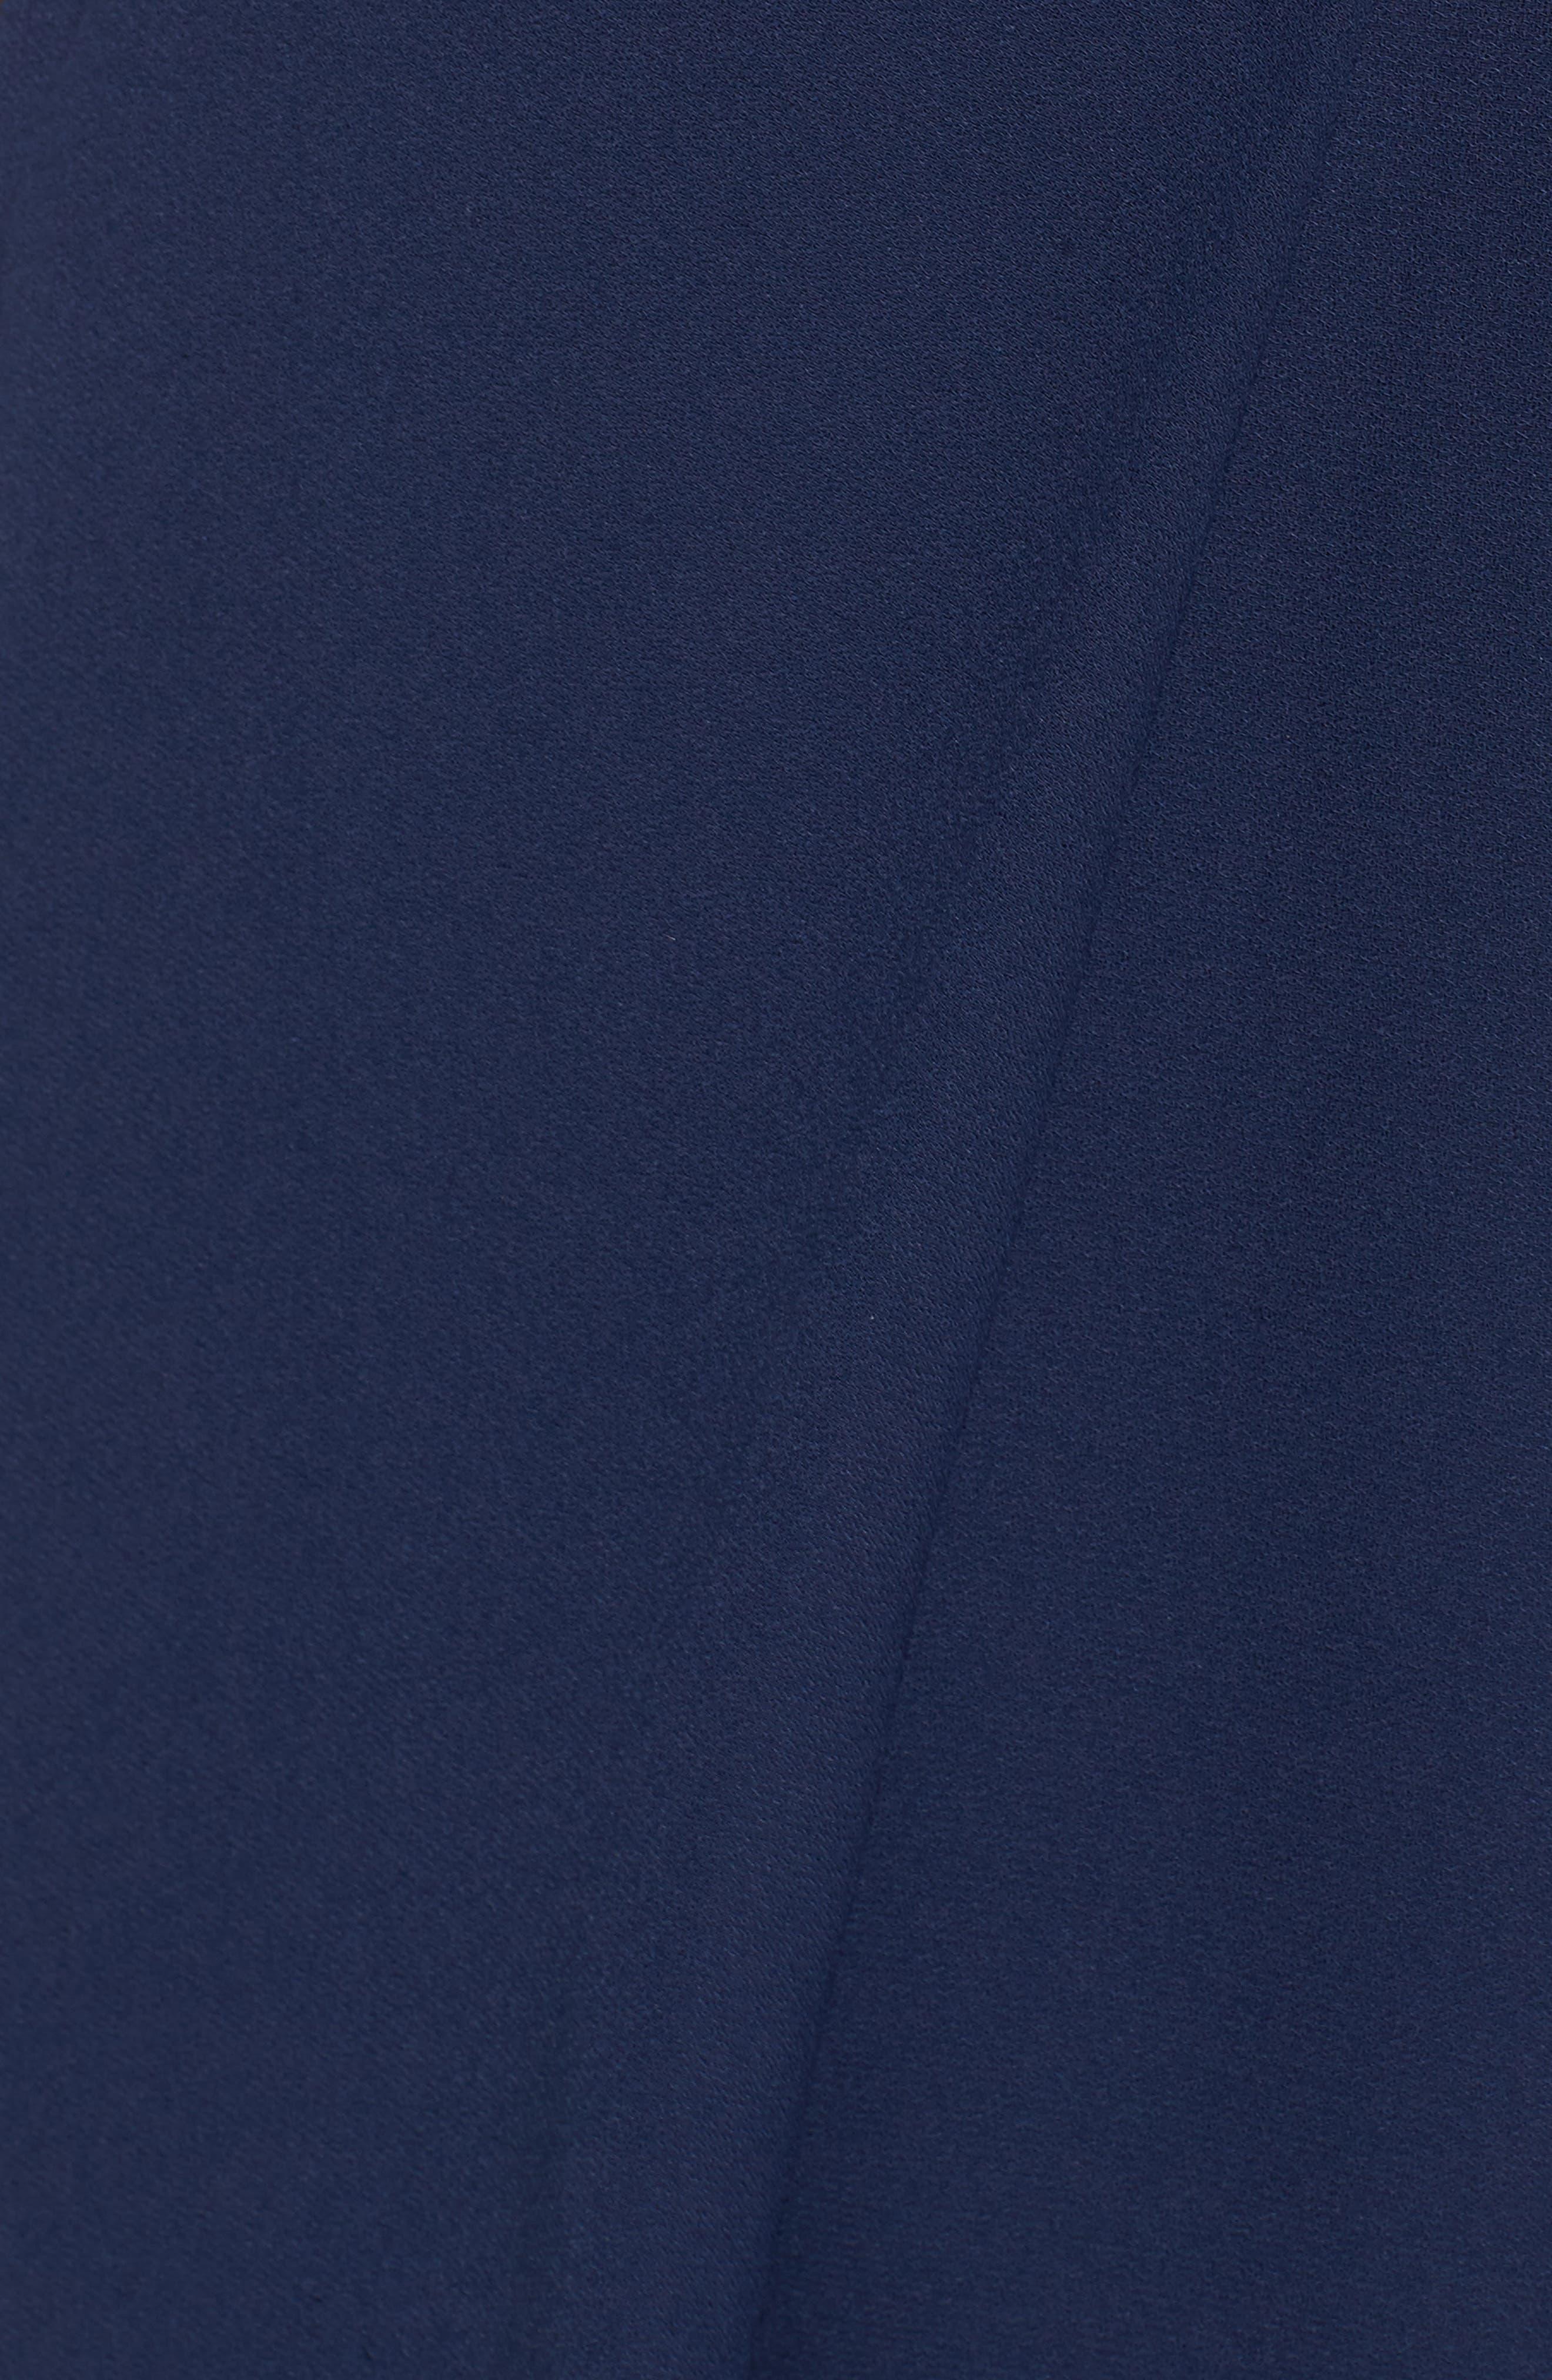 Strapless Crepe Minidress,                             Alternate thumbnail 5, color,                             410